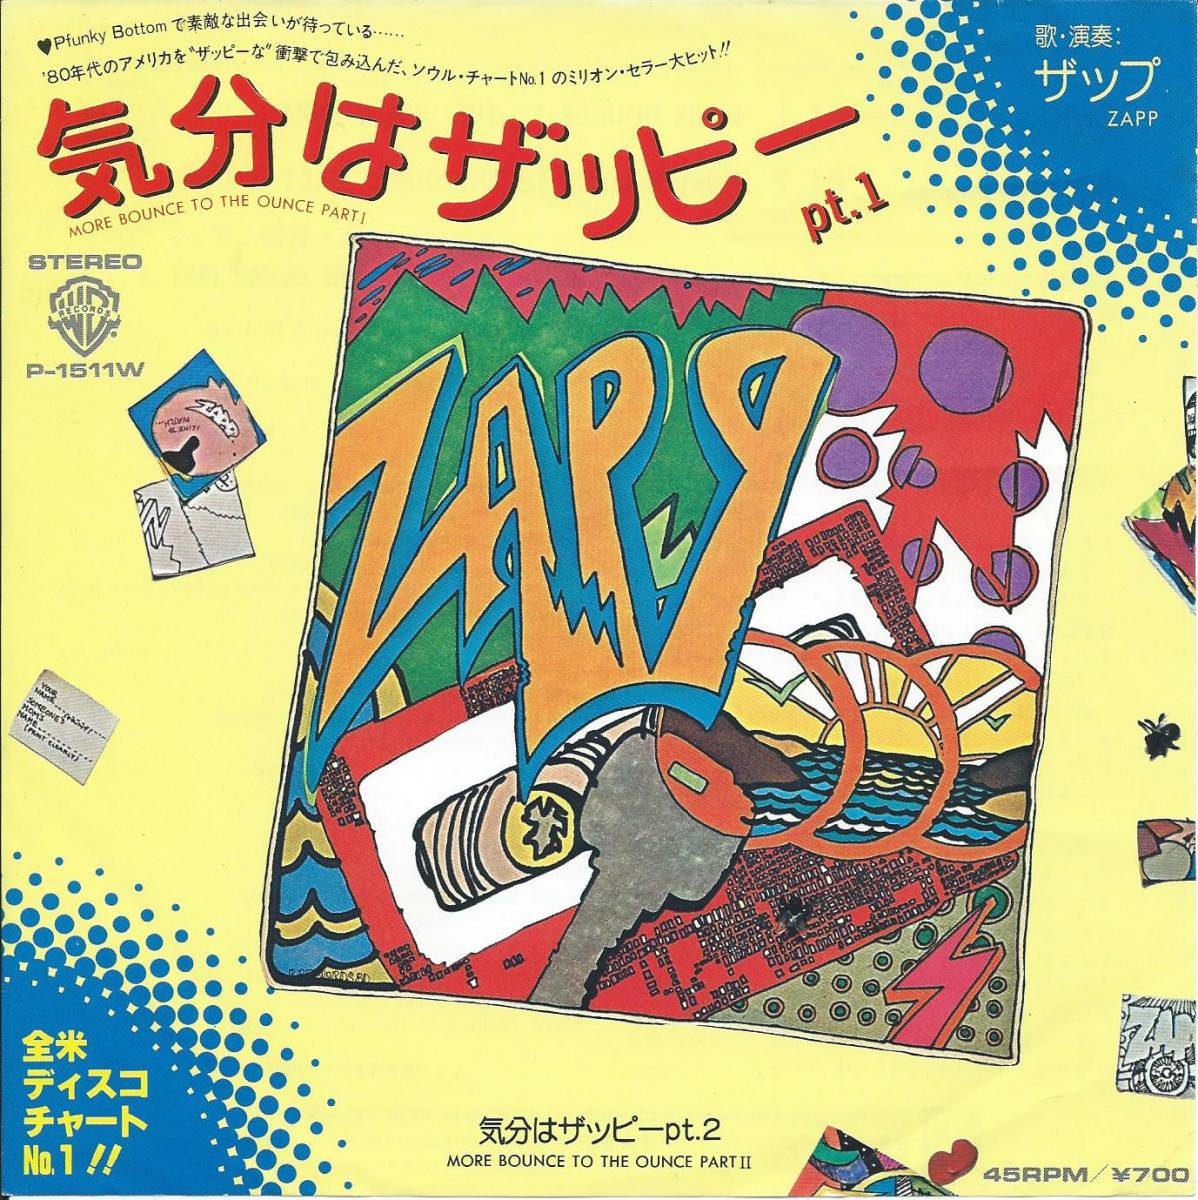 Soul Funk Rare Groove Lp 45s Japan Press Lp Amp 45s